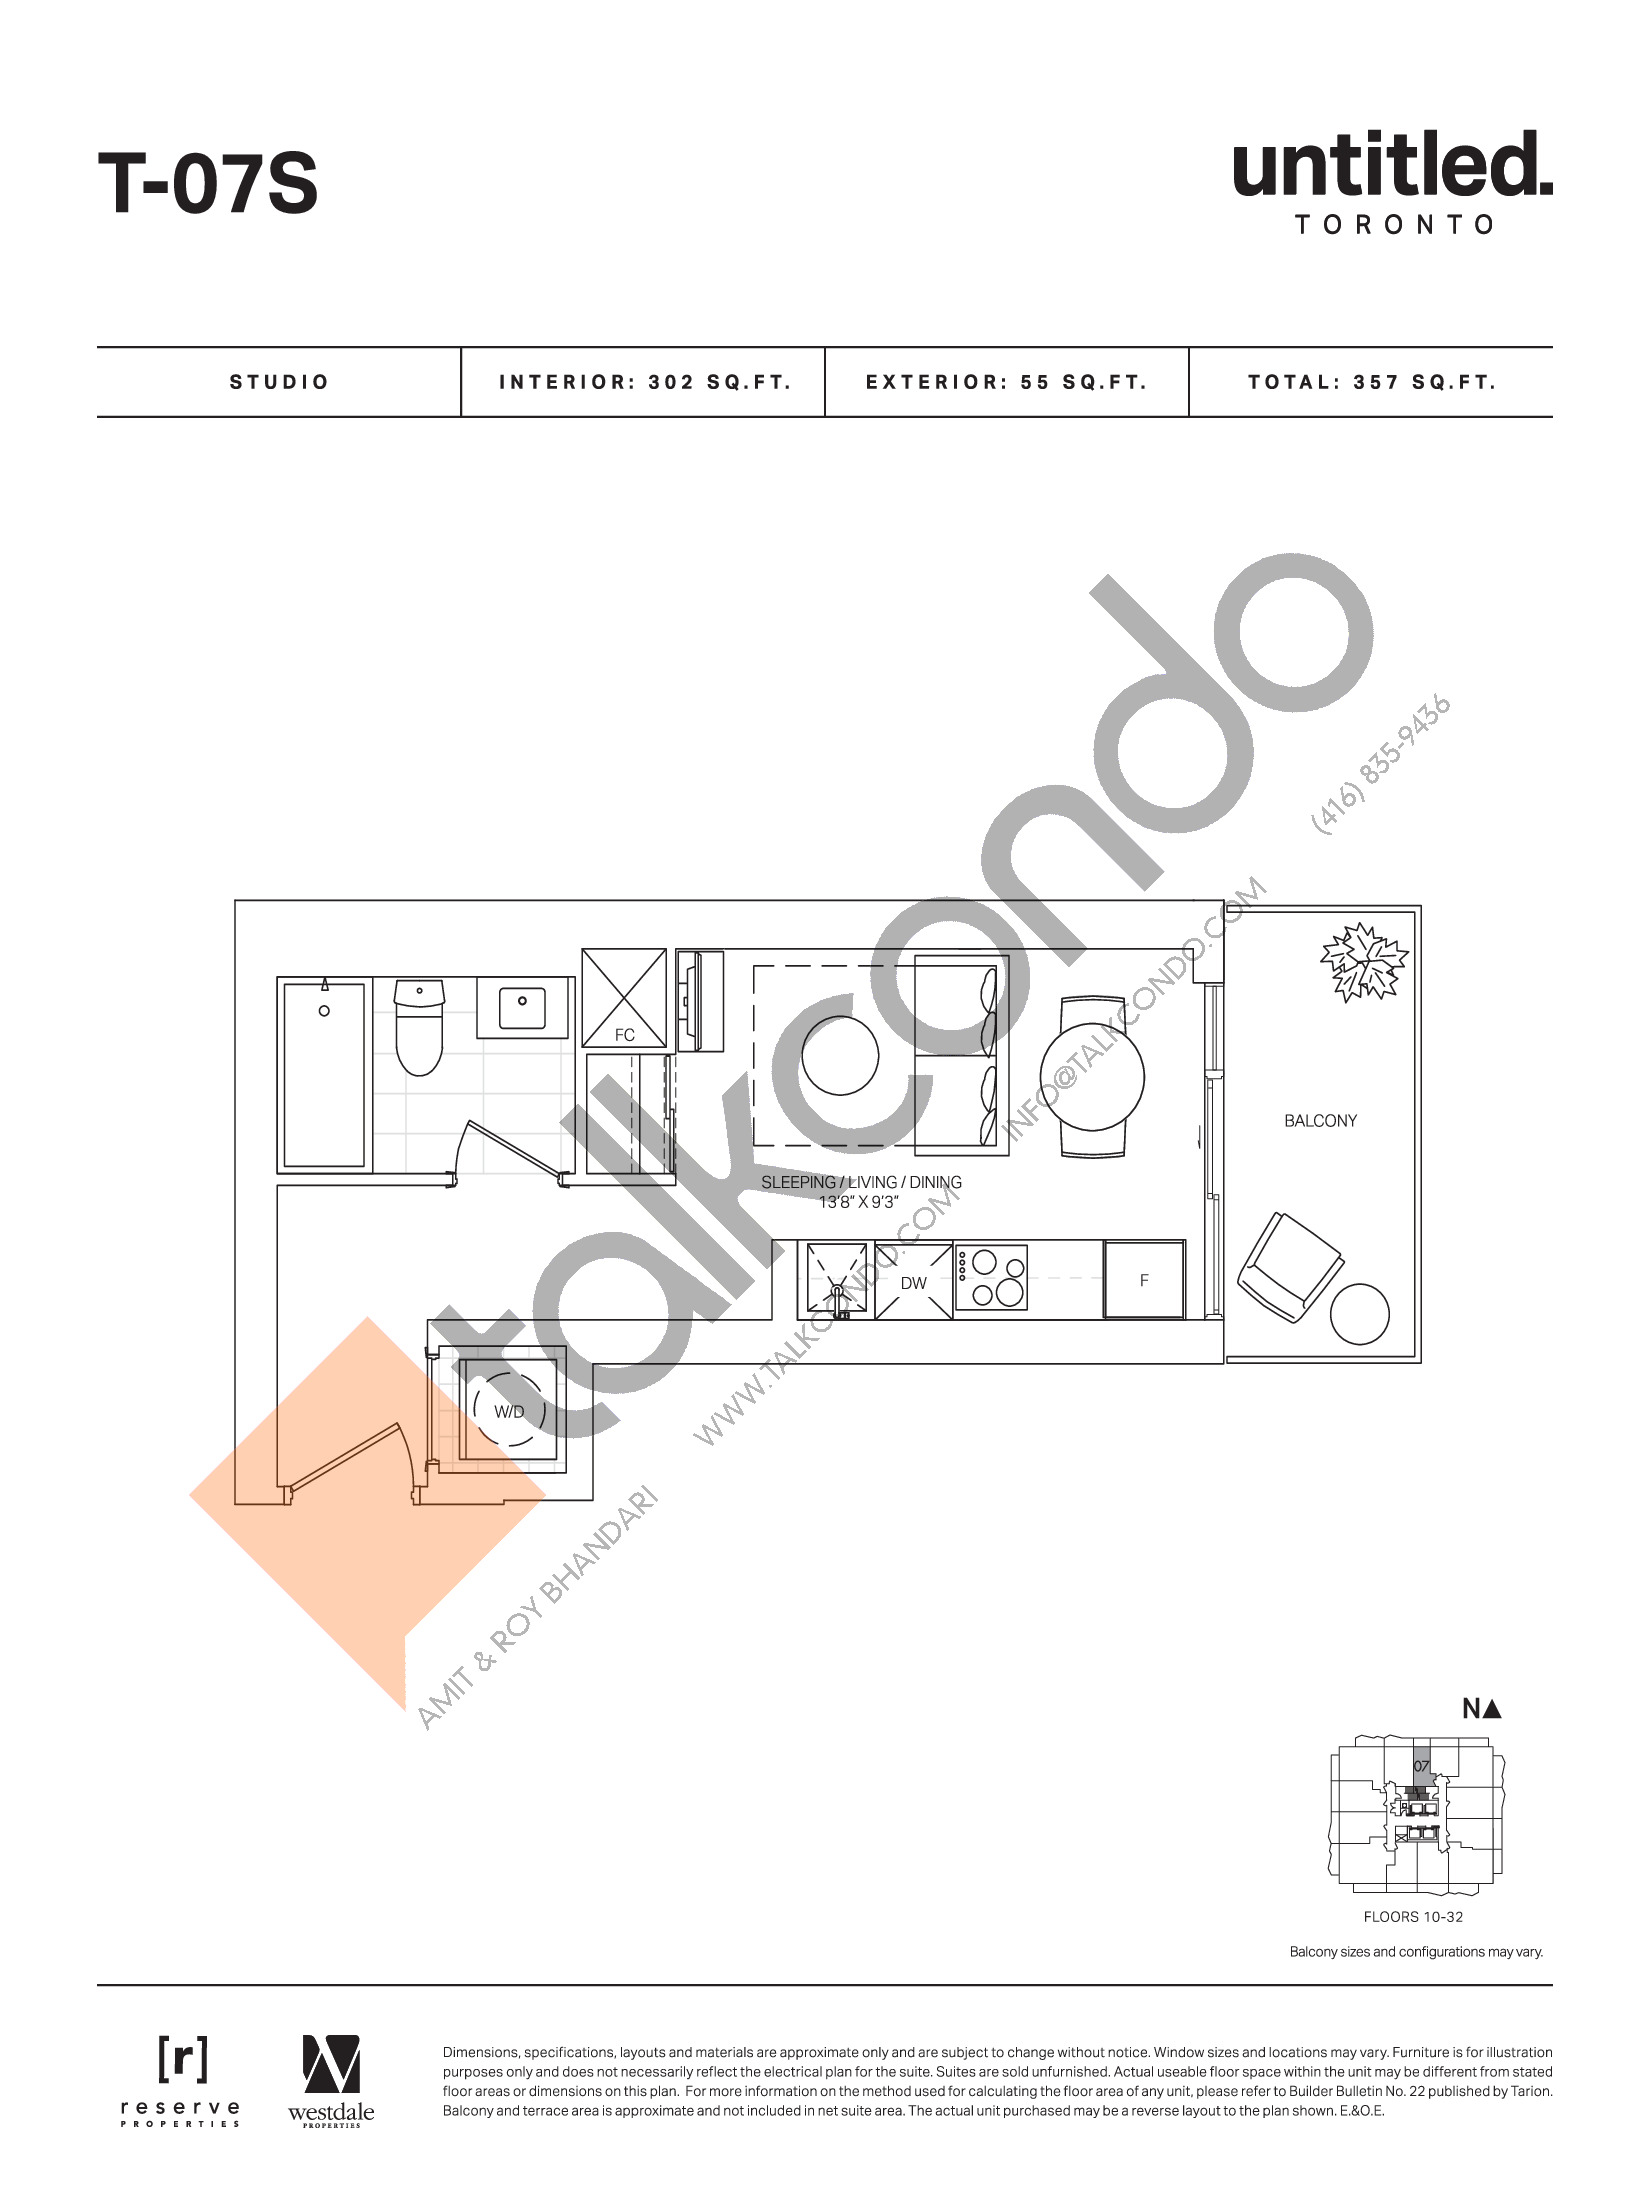 T-07S Floor Plan at Untitled Toronto Condos - 302 sq.ft